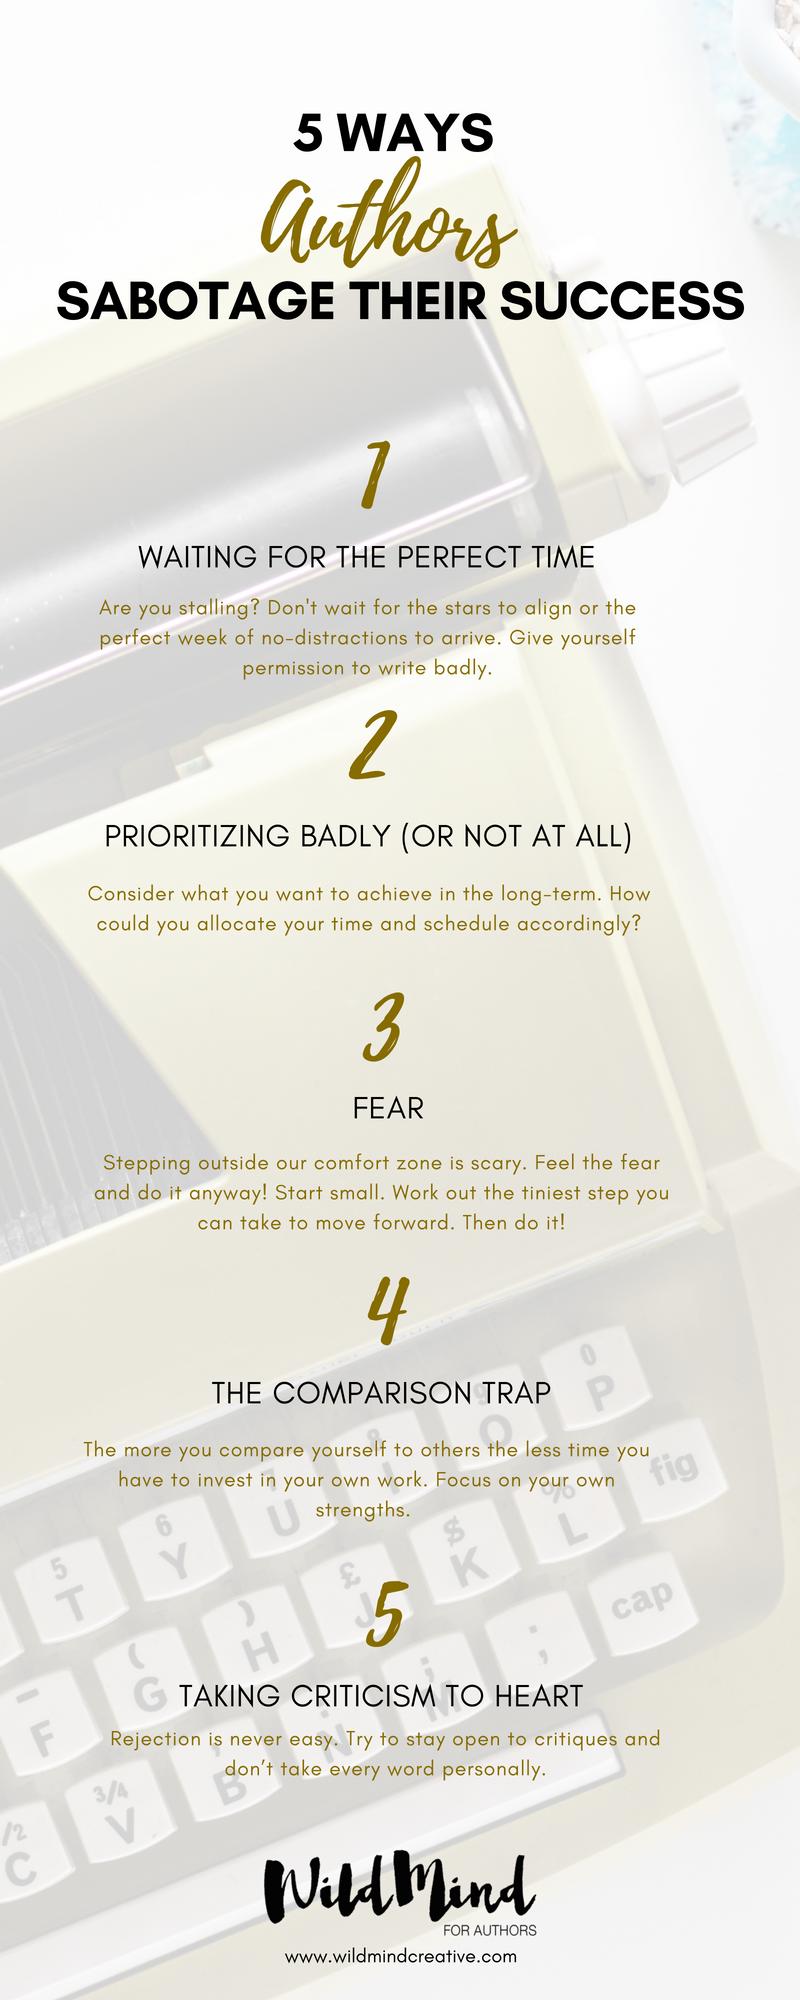 5 Ways Authors Sabotage Themselves